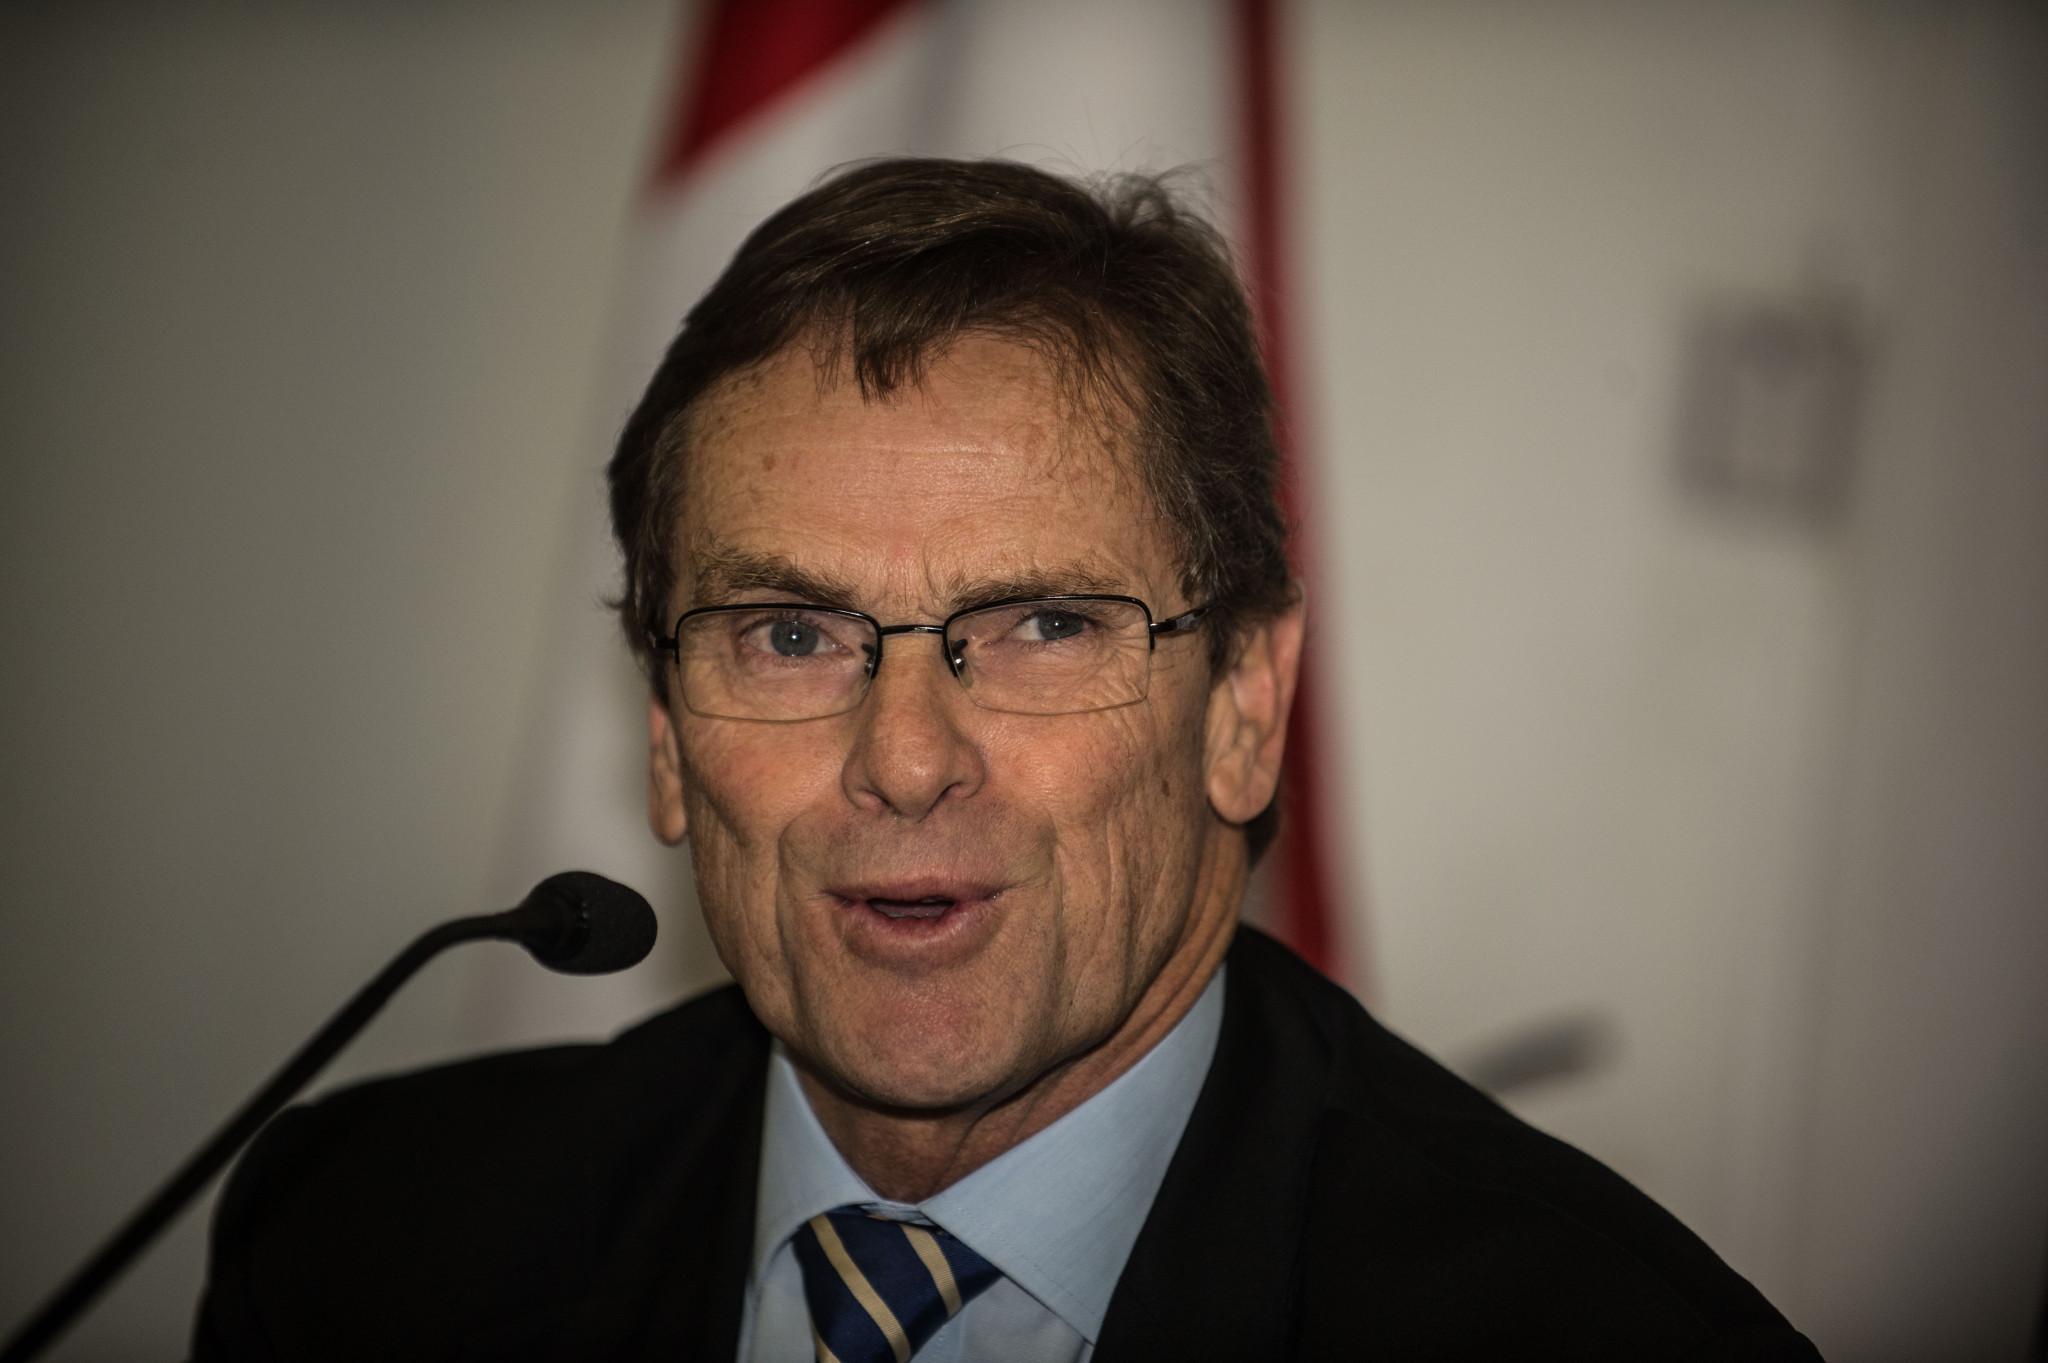 Lima 2019 President Neuhaus praises partnership with British Government